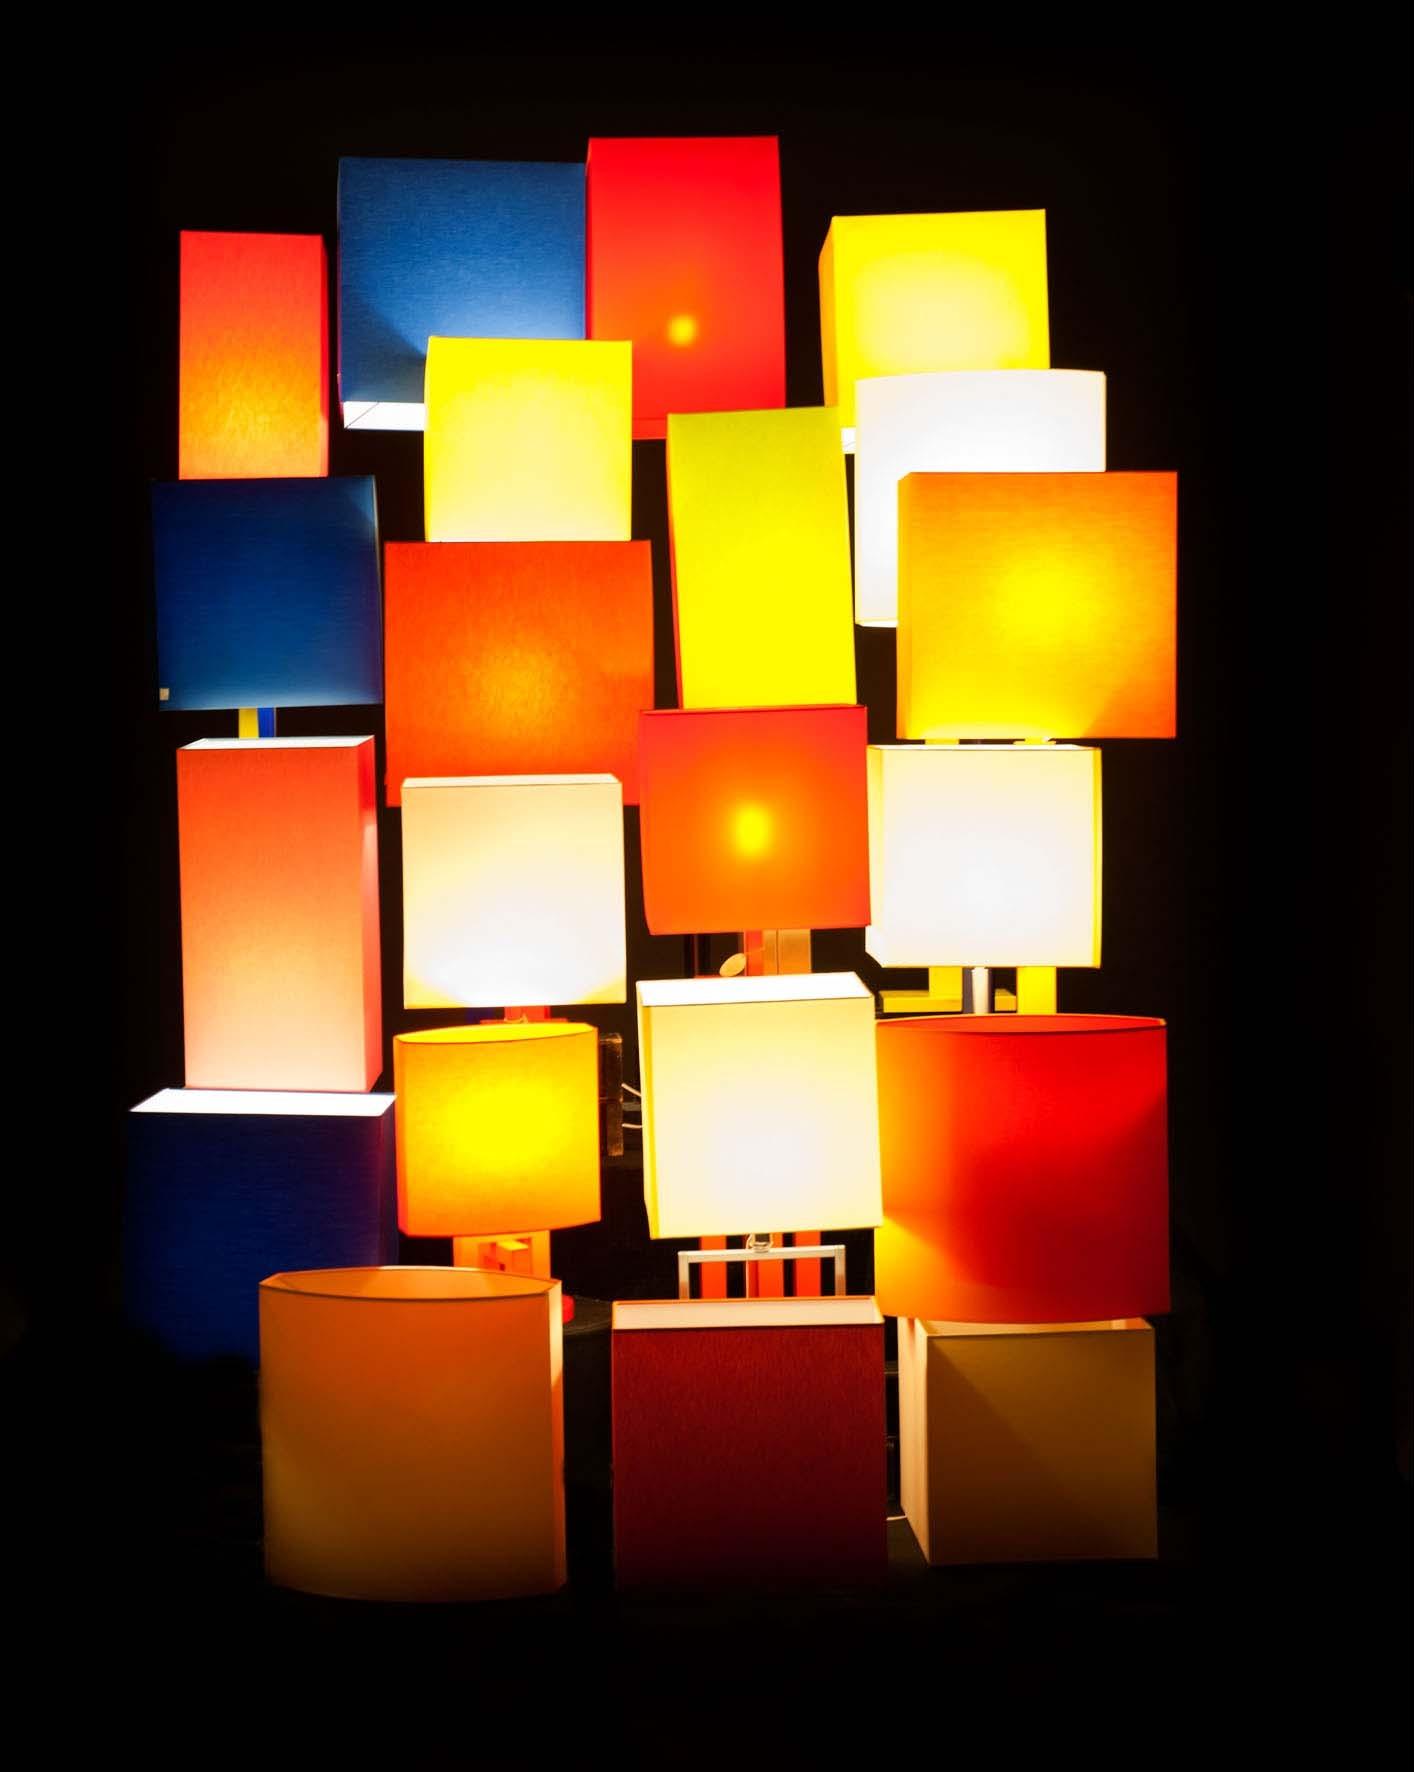 Jaapdeboer advertentie de westereender keaplju for Design lampen nachbau